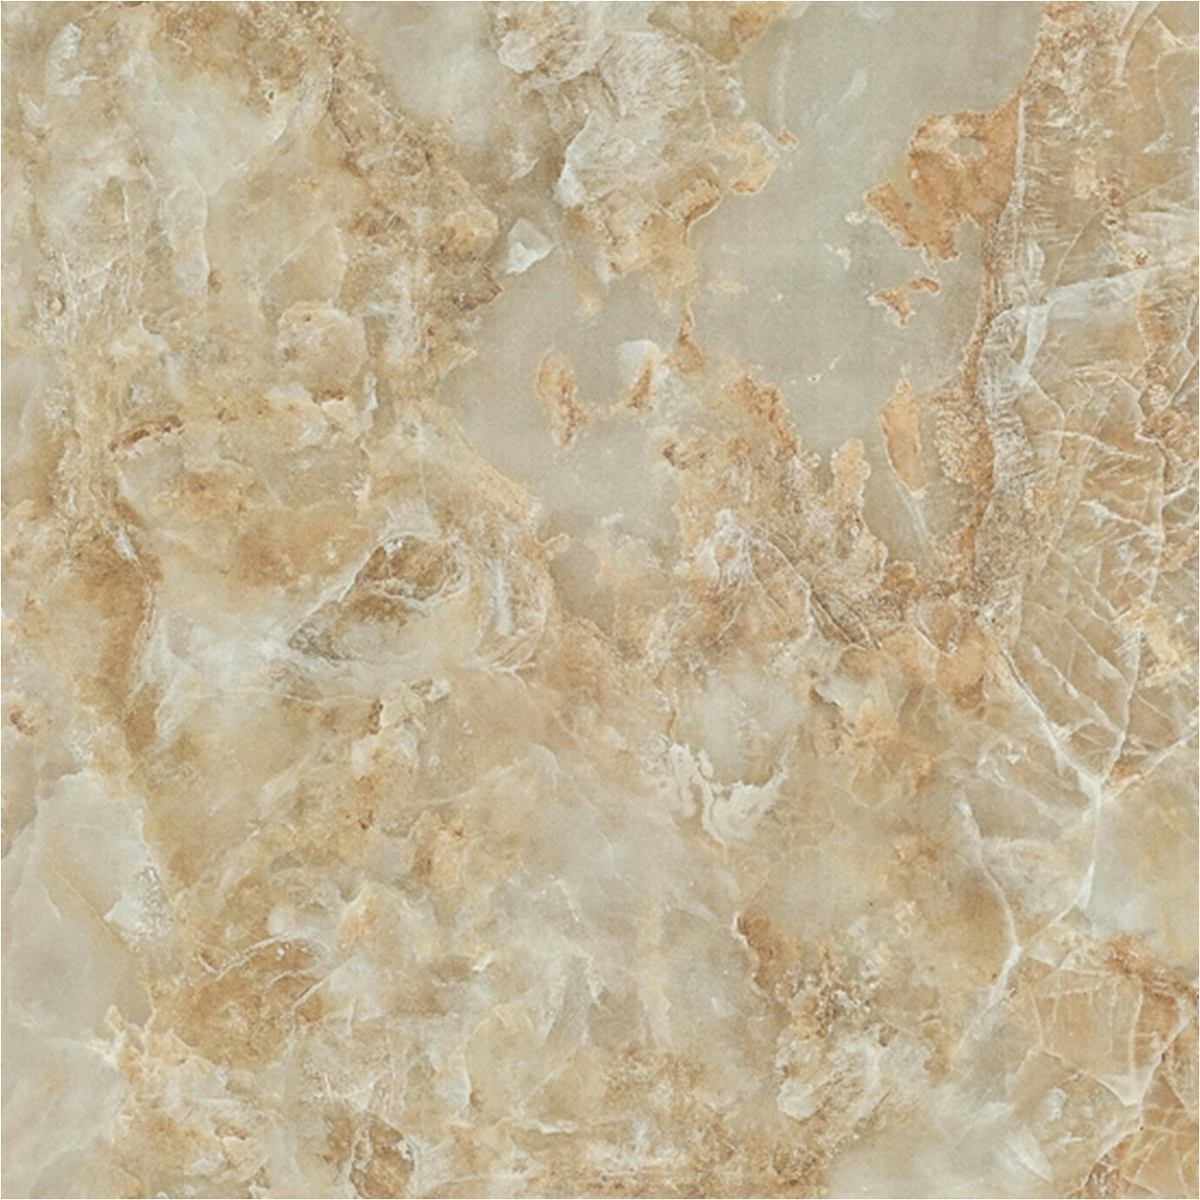 Porcelanato tipo marmol bs en mercado libre for Diferentes tipos de marmol